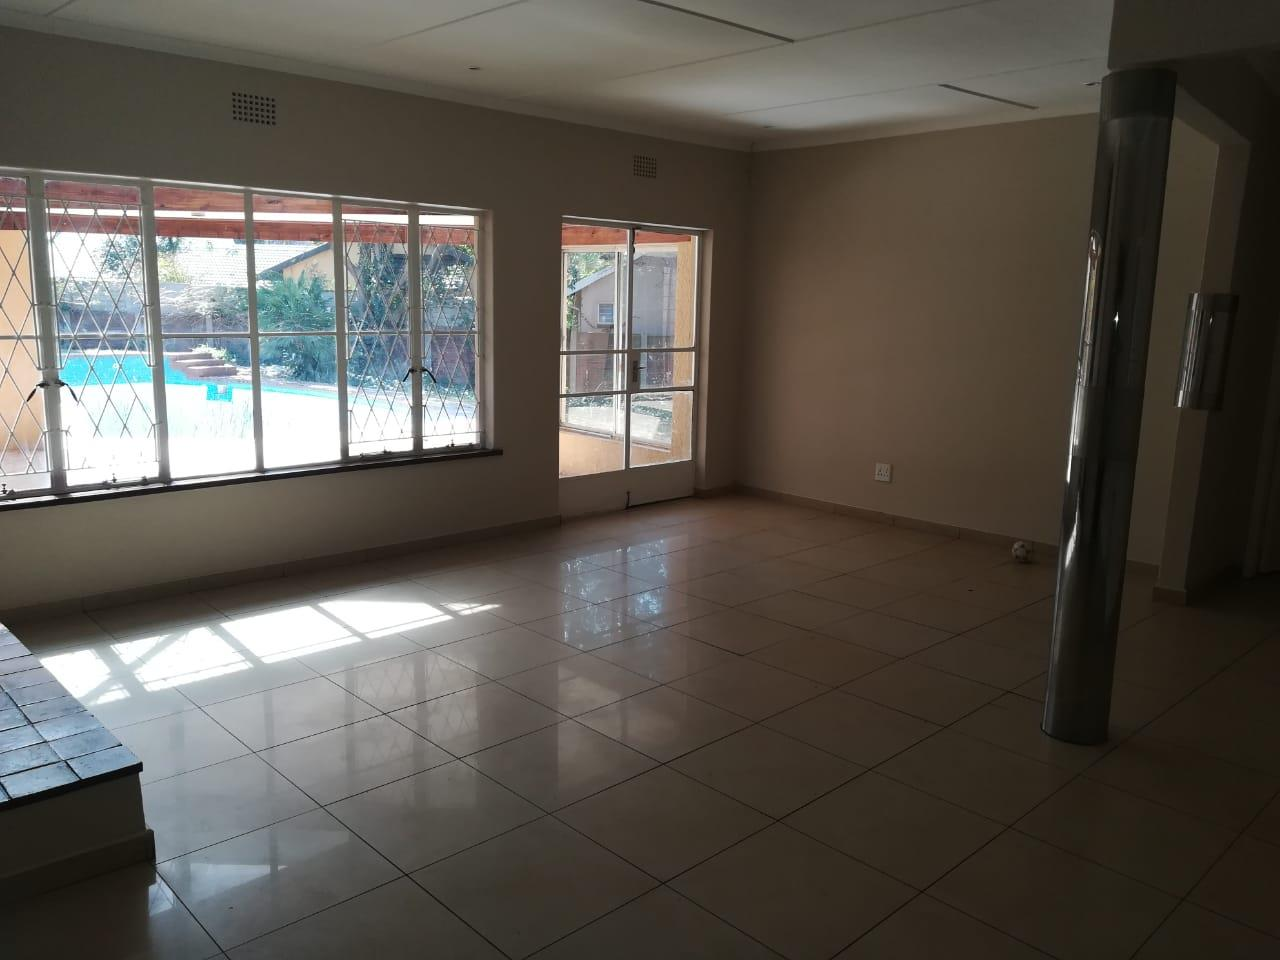 4 Bedroom House For Sale in Constantia Kloof